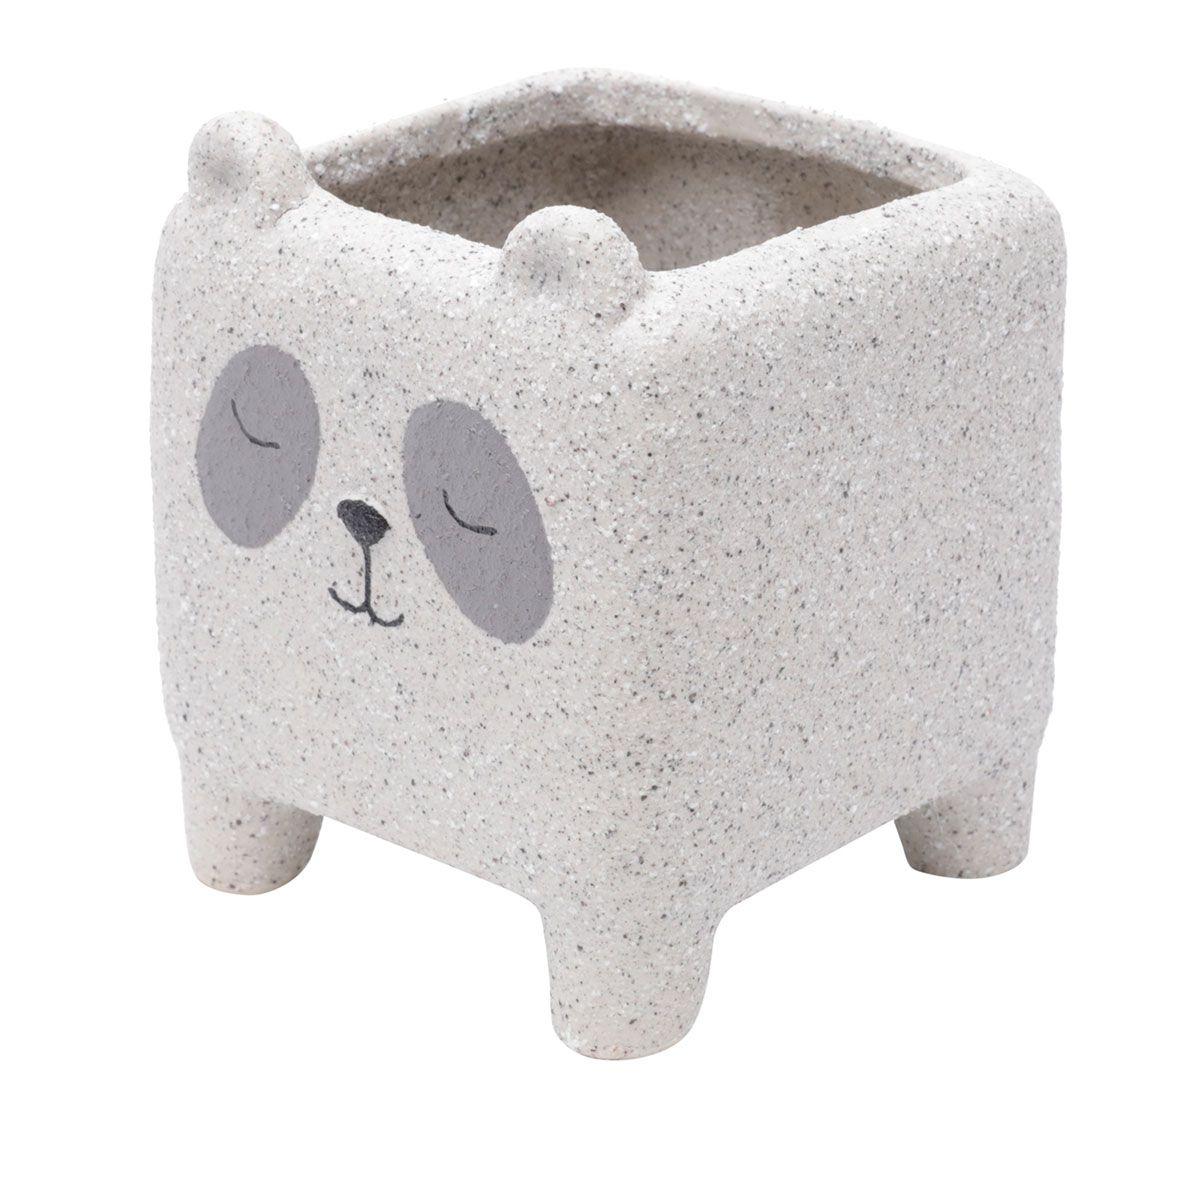 Kit 2 Cachepot Concreto Vaso Decorativo Sleeping Dog e Panda